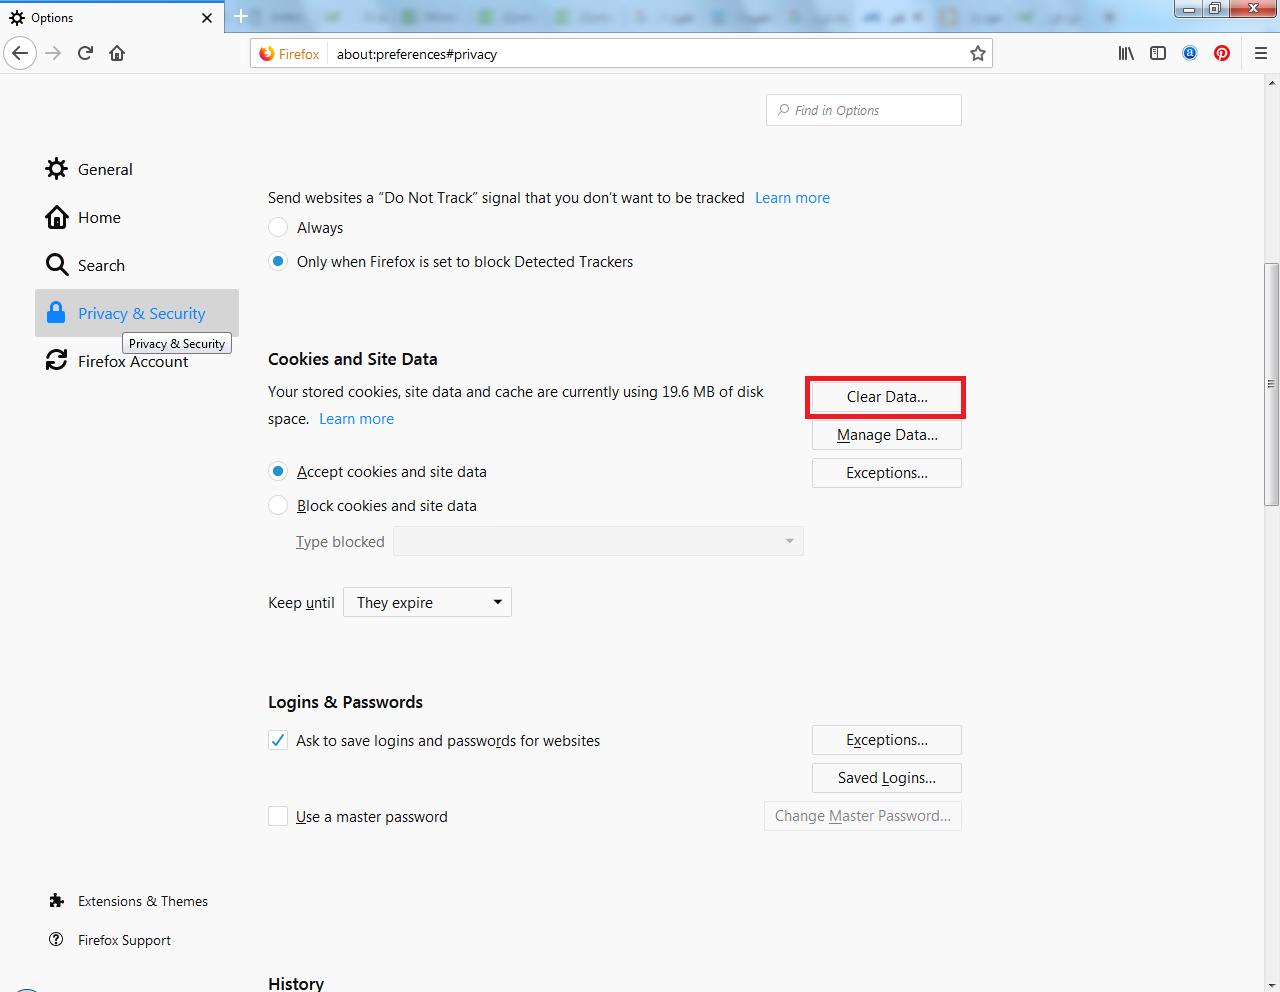 پاک کردن کش فایرفاکس بخش حریم خصوصی و امنیت